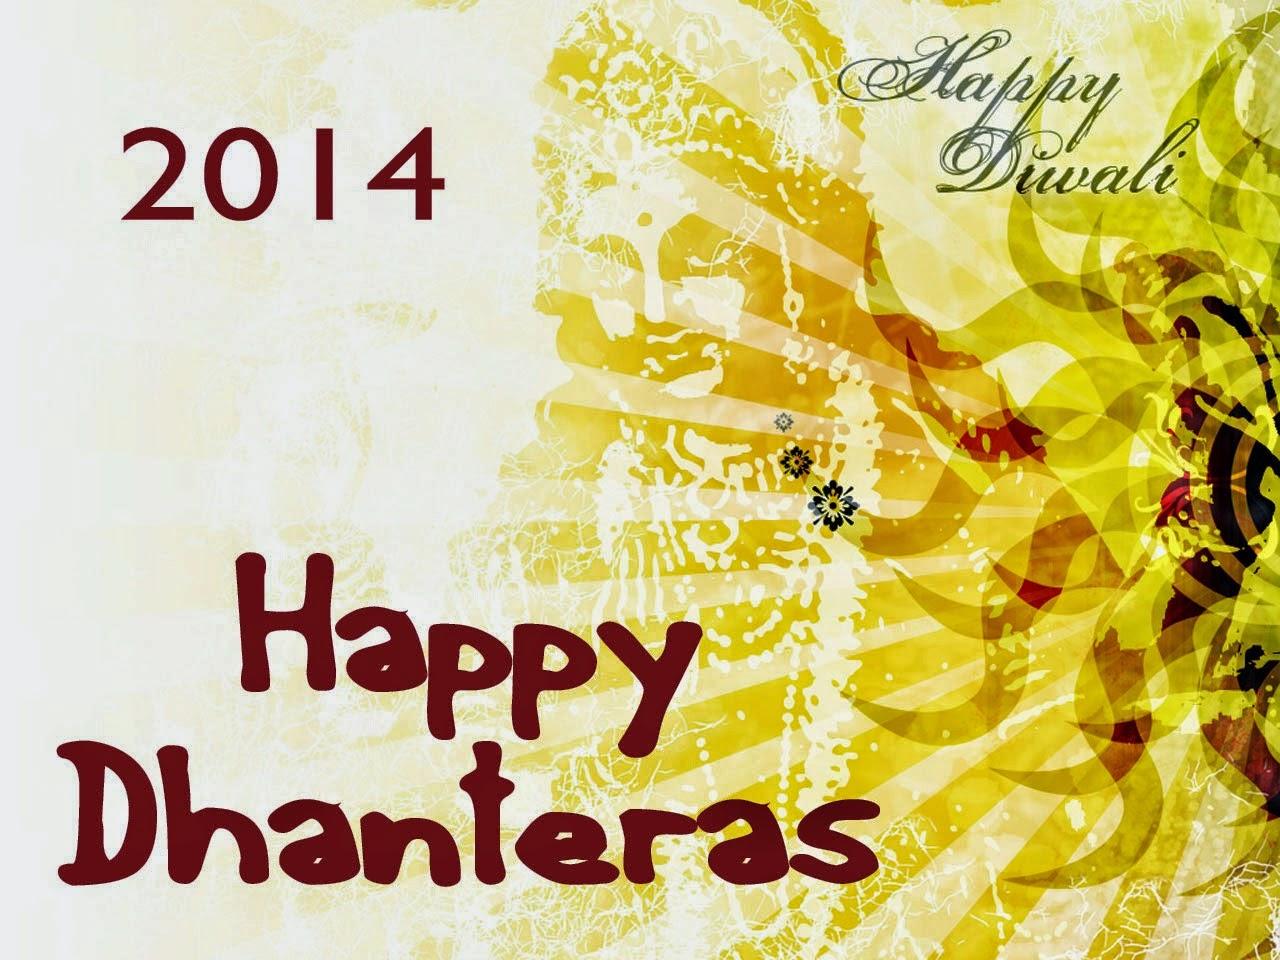 Whishing Nice Happy dhanteras 2014 HD Wallpaper